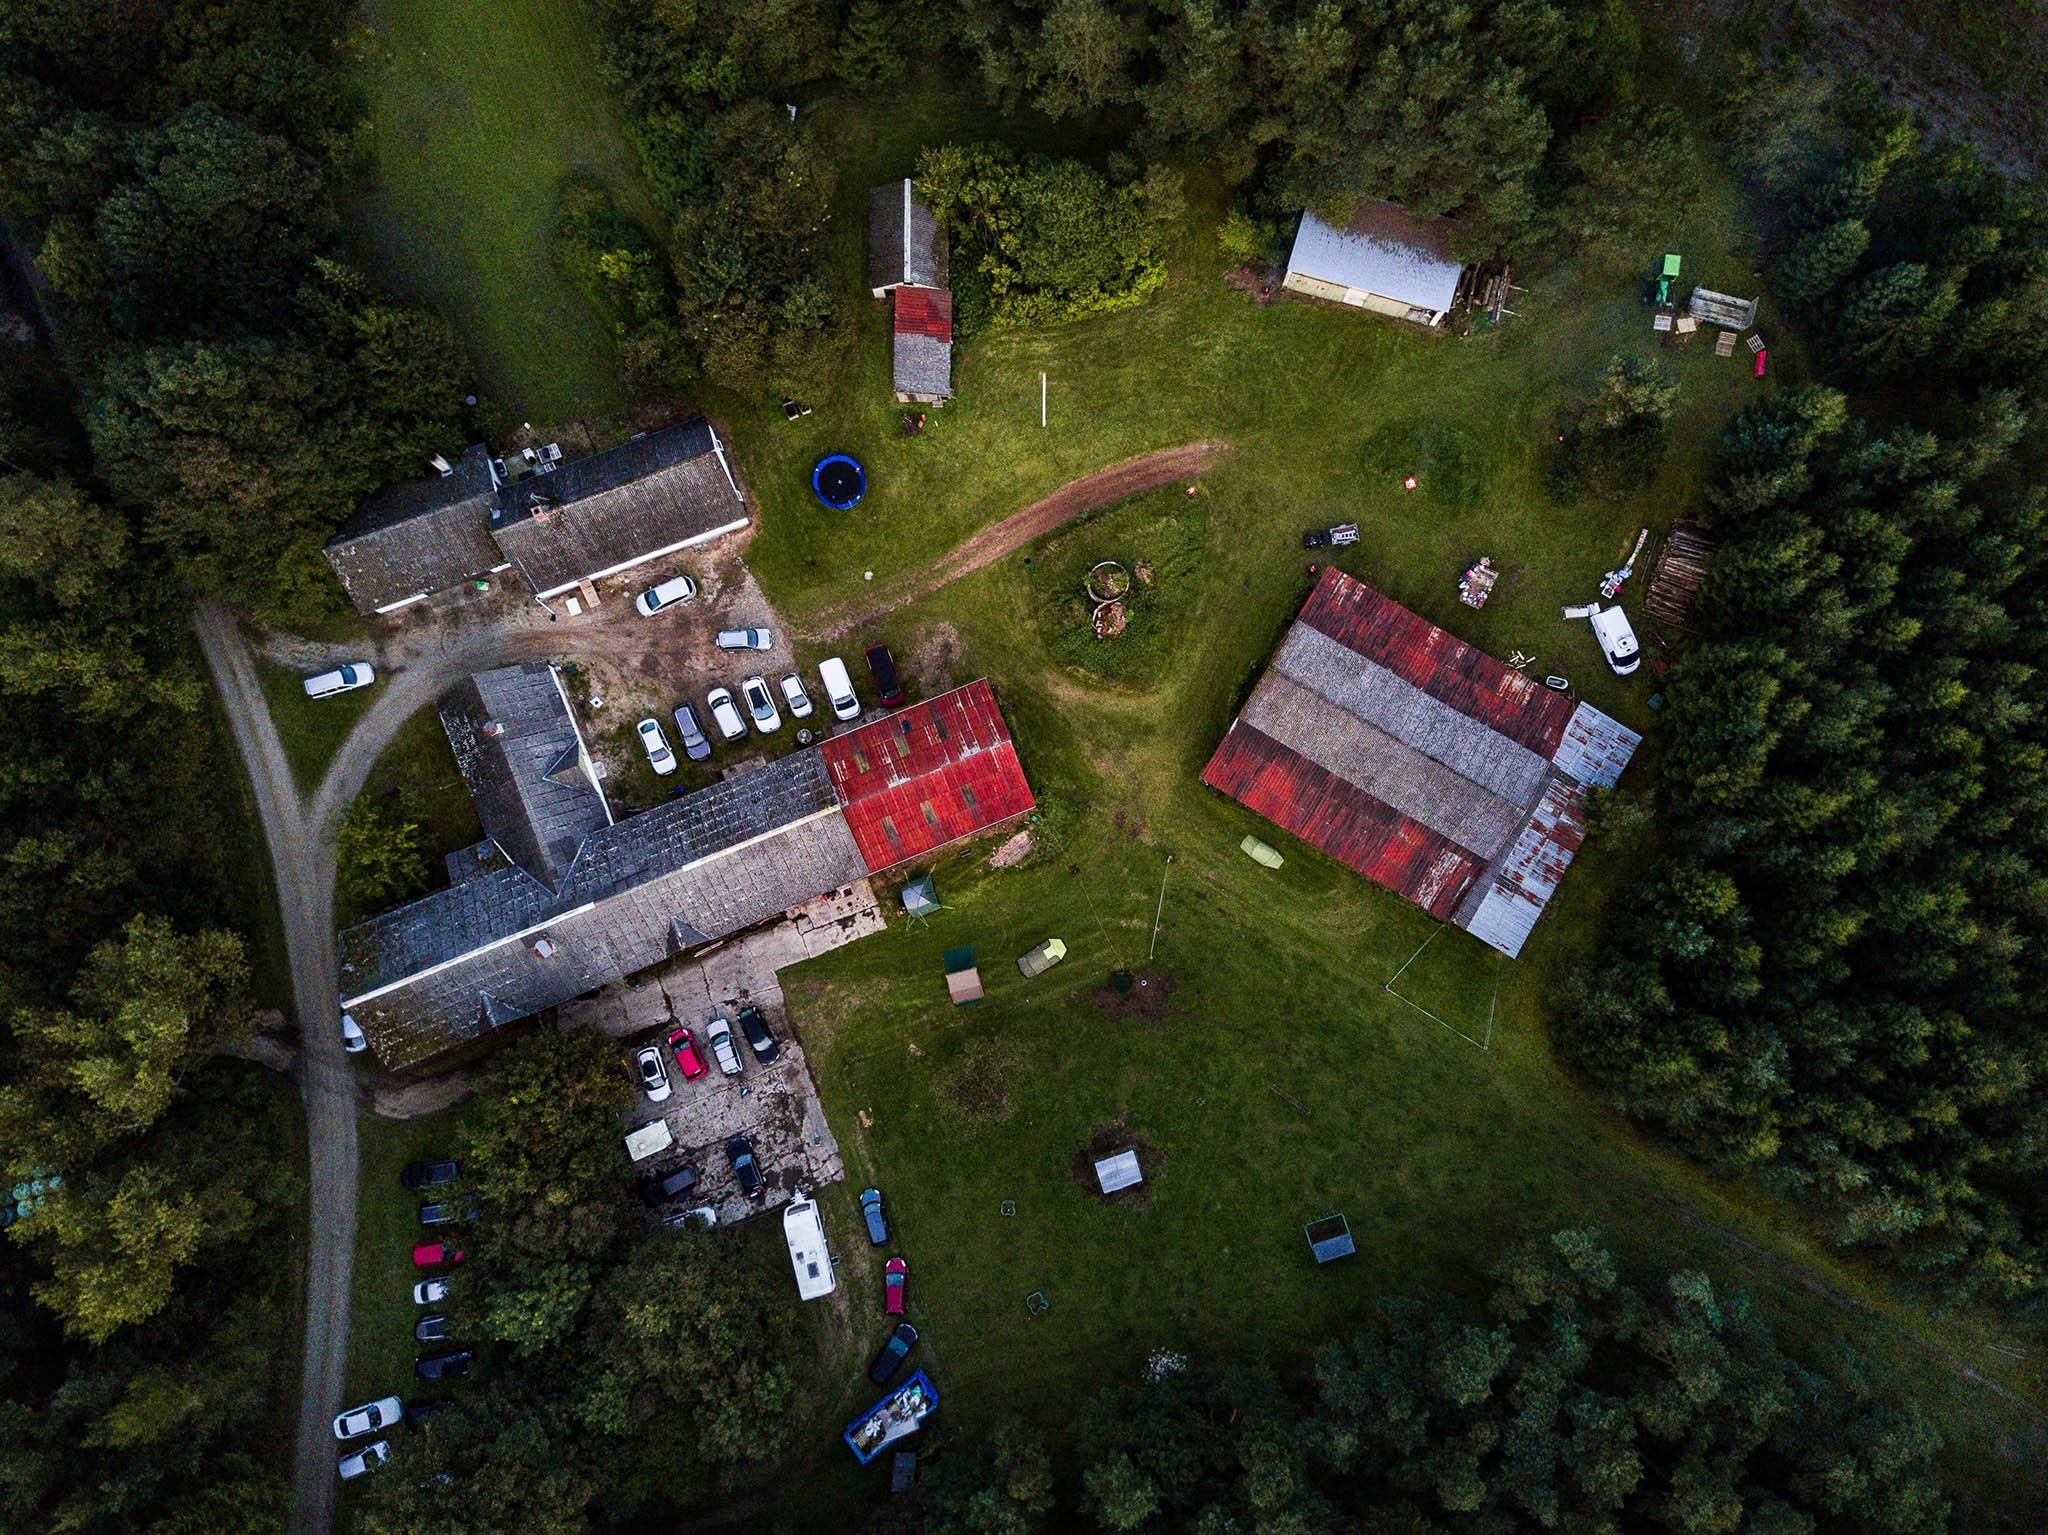 Dronefoto: Theis Poulsen